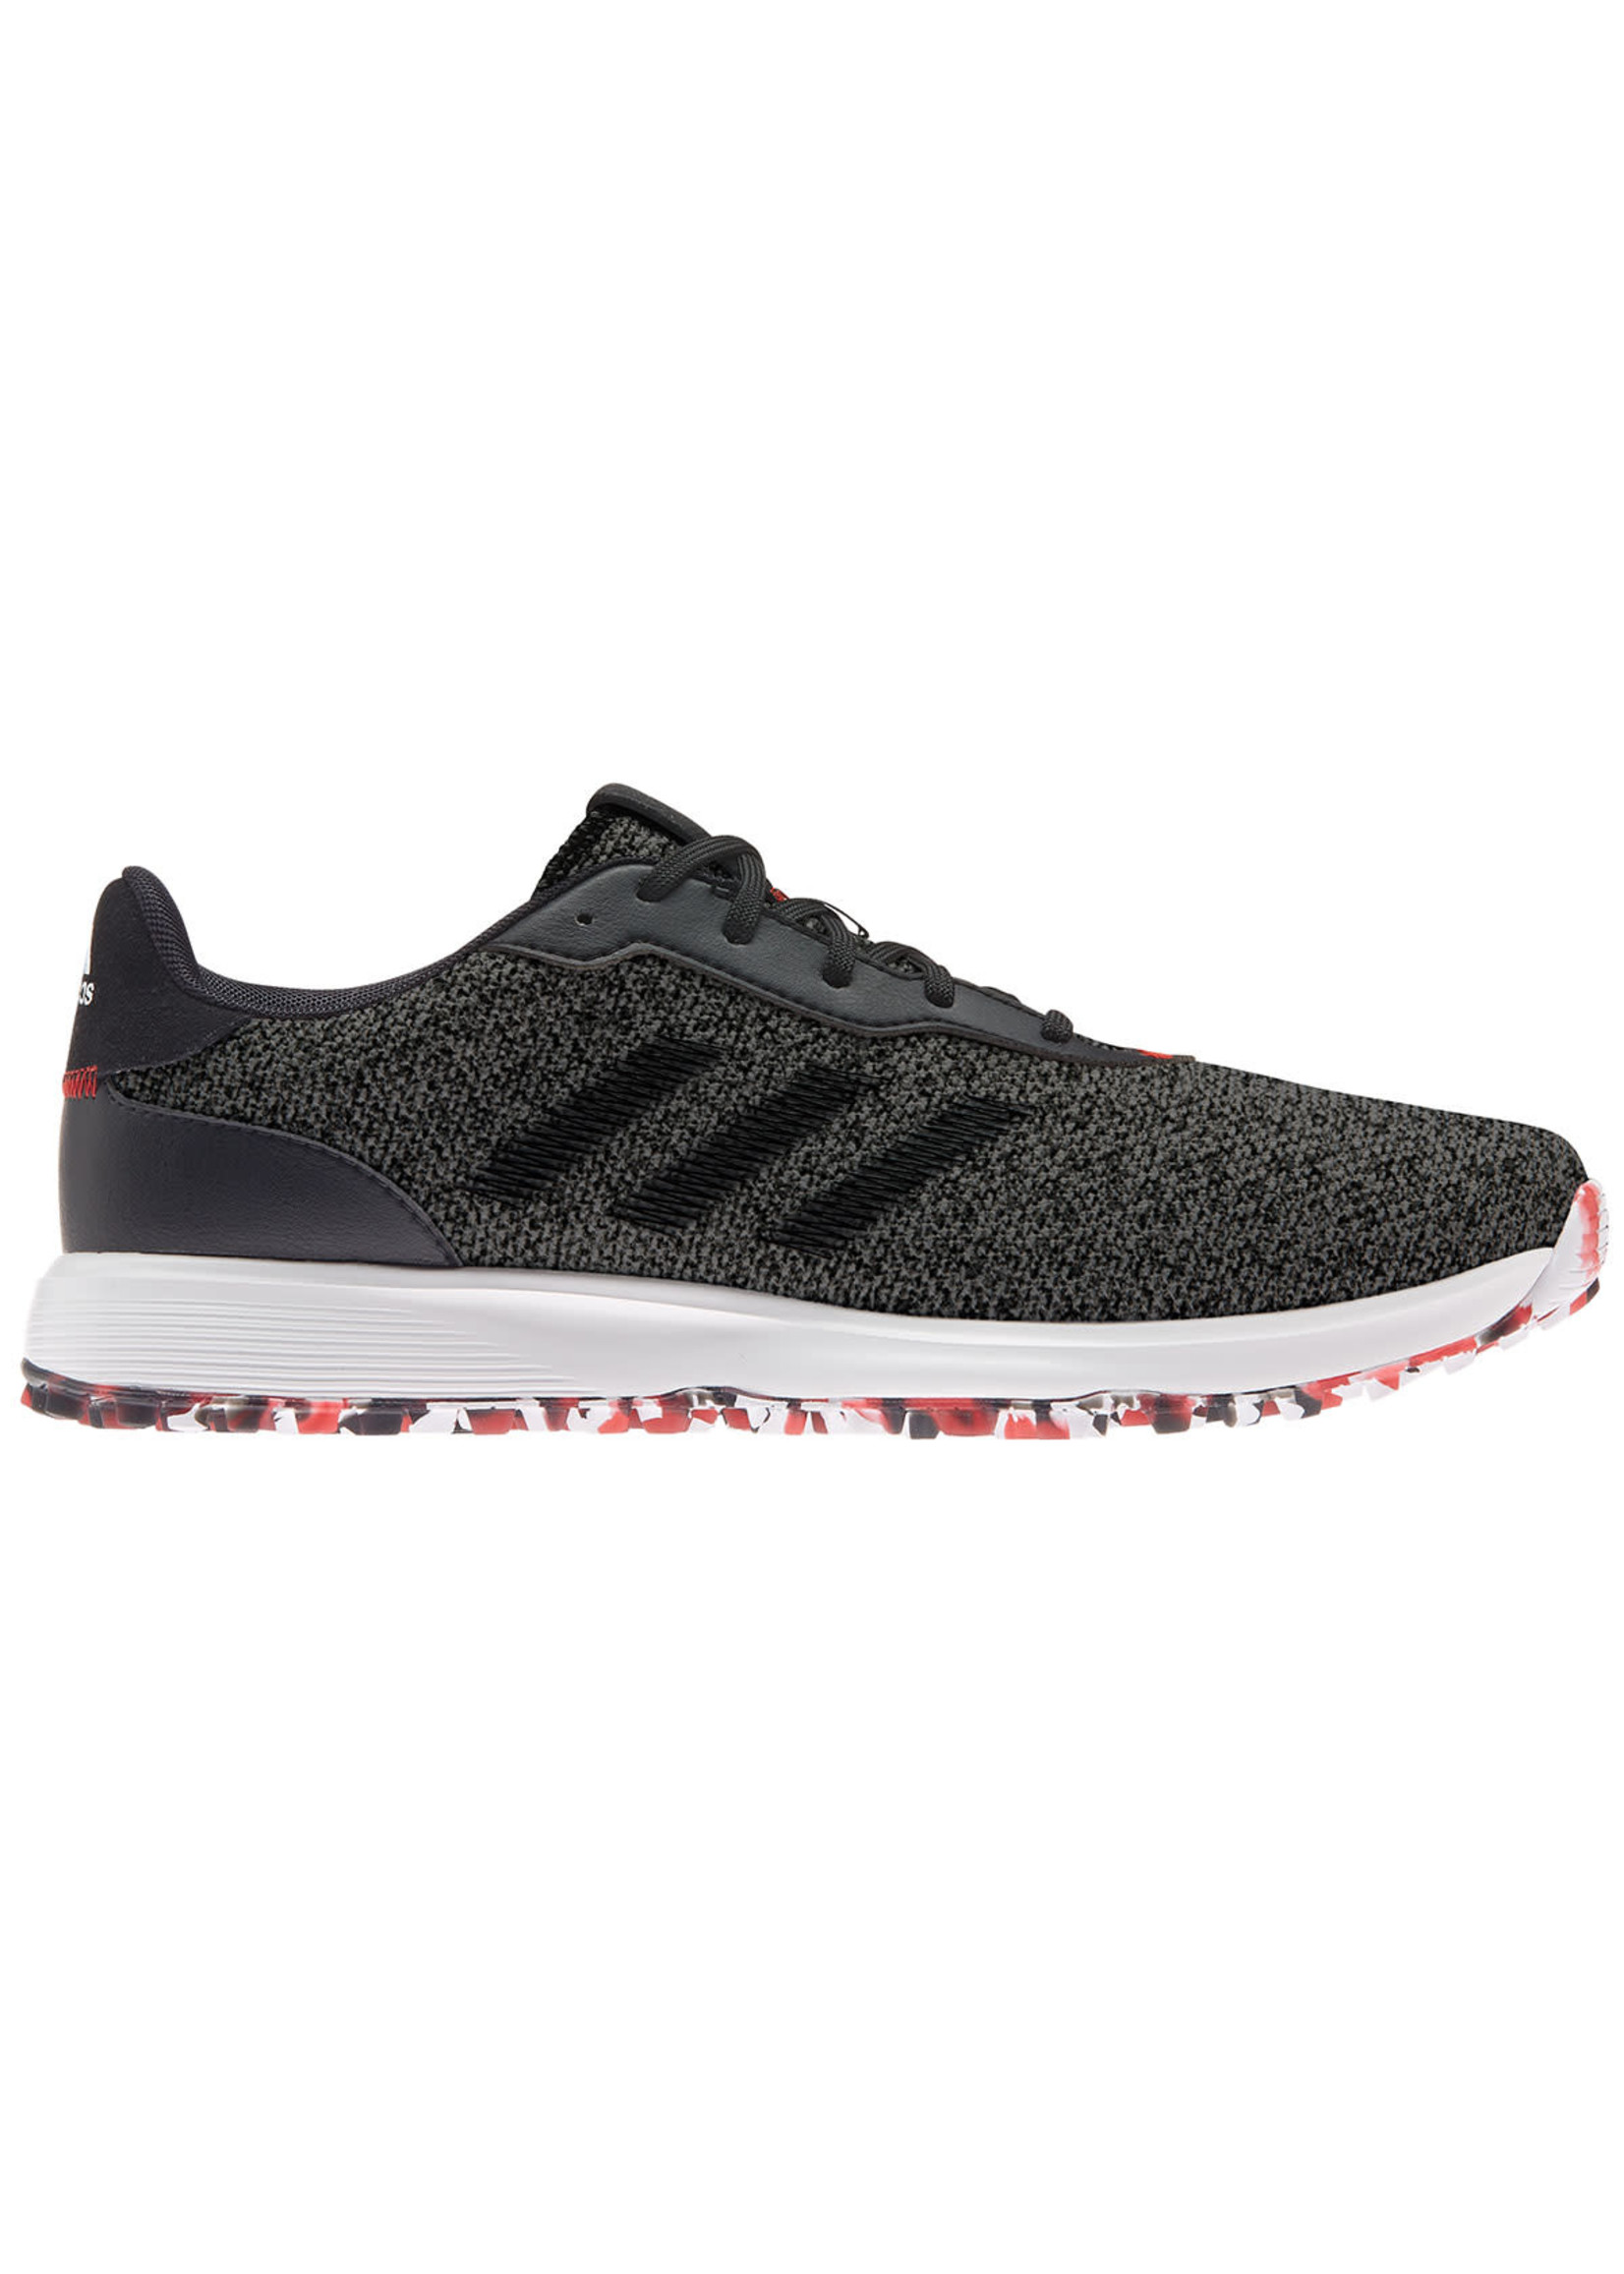 Adidas Adidas S2G Mens Spikeless Golf Shoe, Grey / Black / Scarlet (2021)